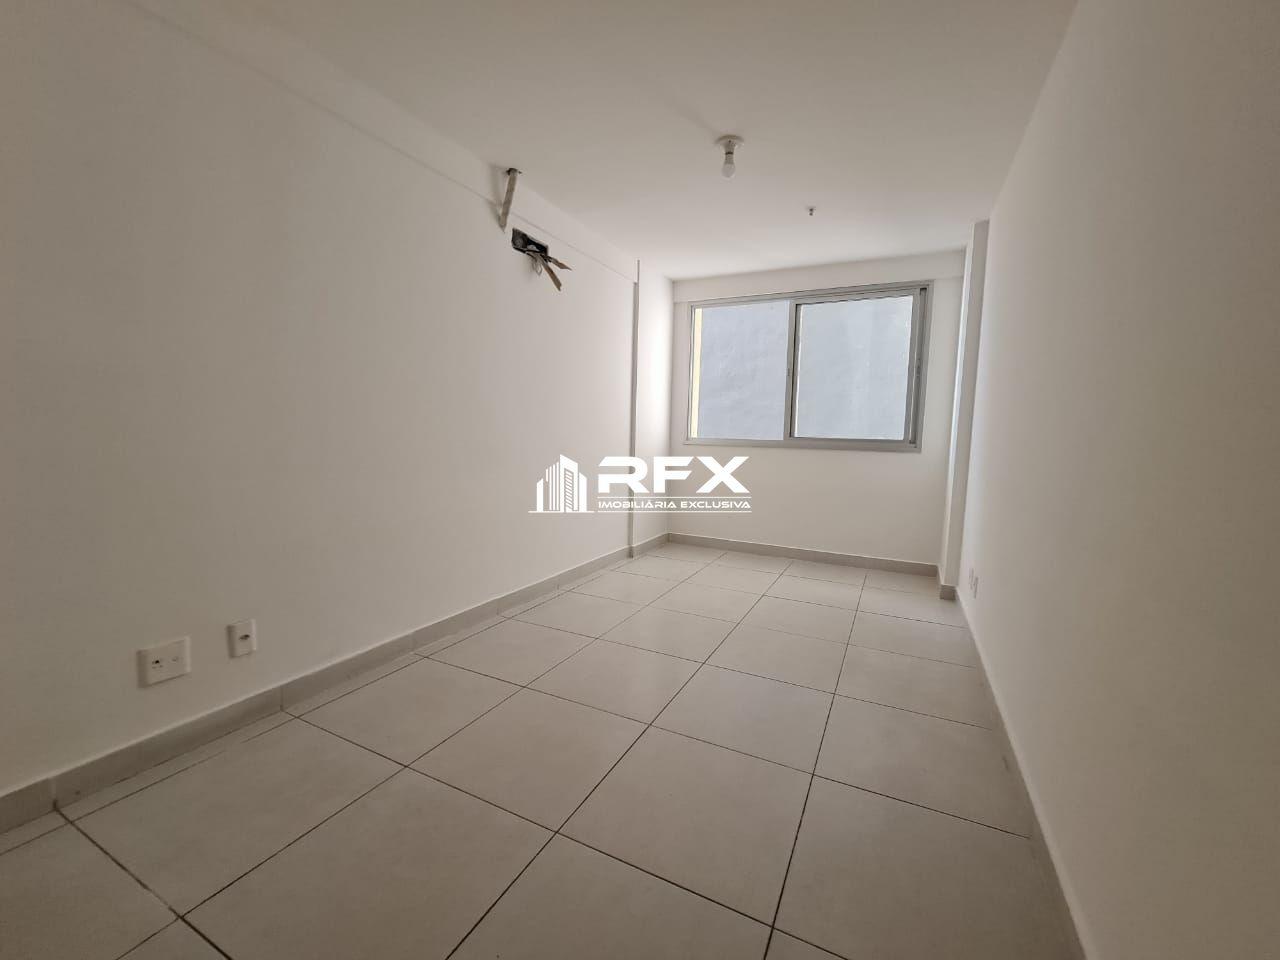 Apartamento para alugar  no Centro - Niterói, RJ. Imóveis